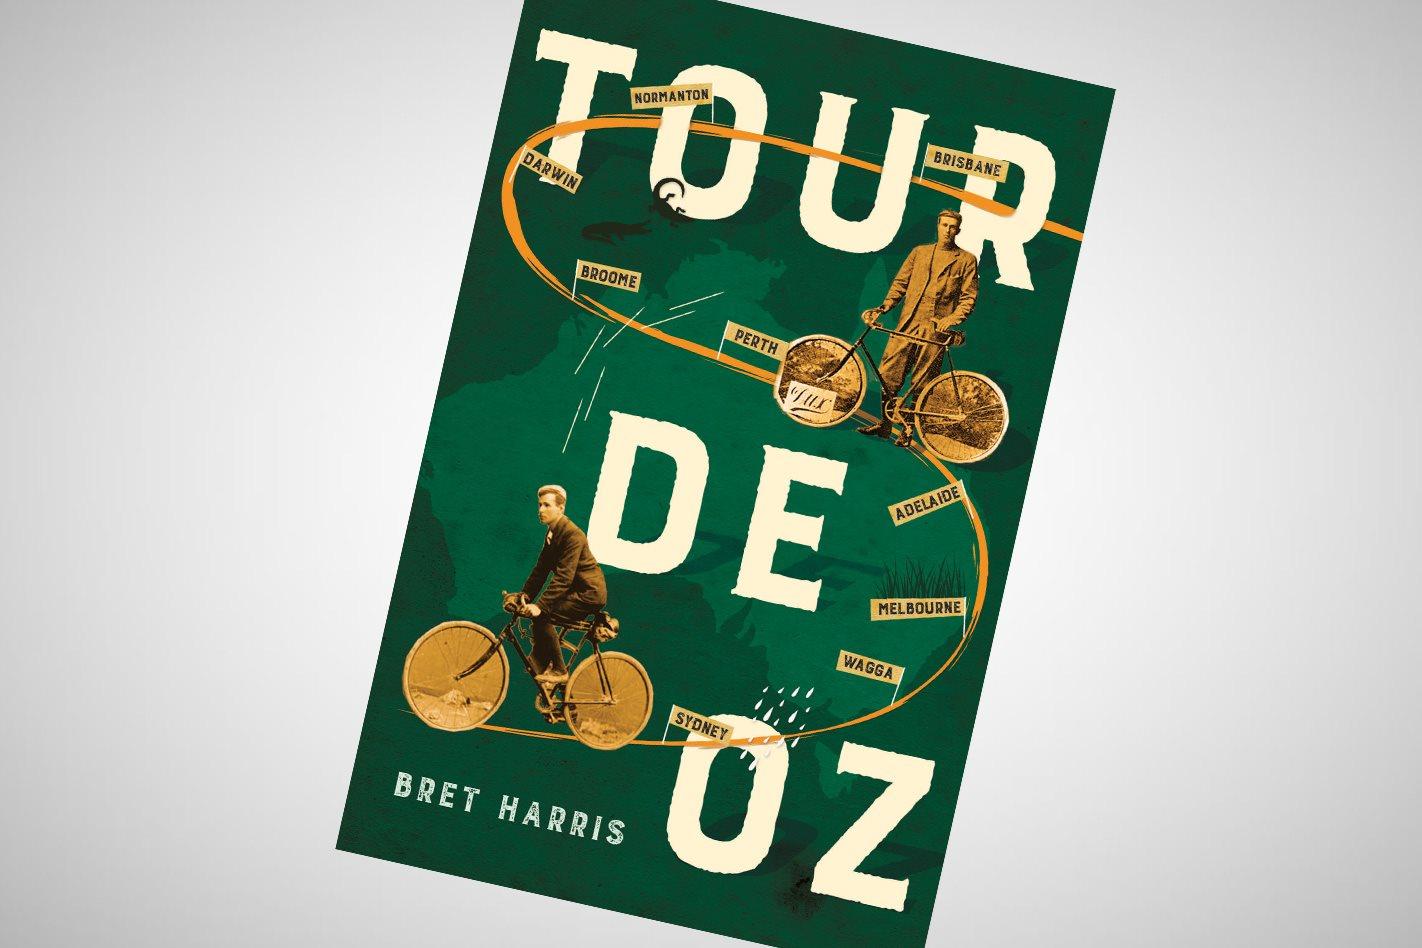 Tour-De-Oz-Bret-Harris.jpg